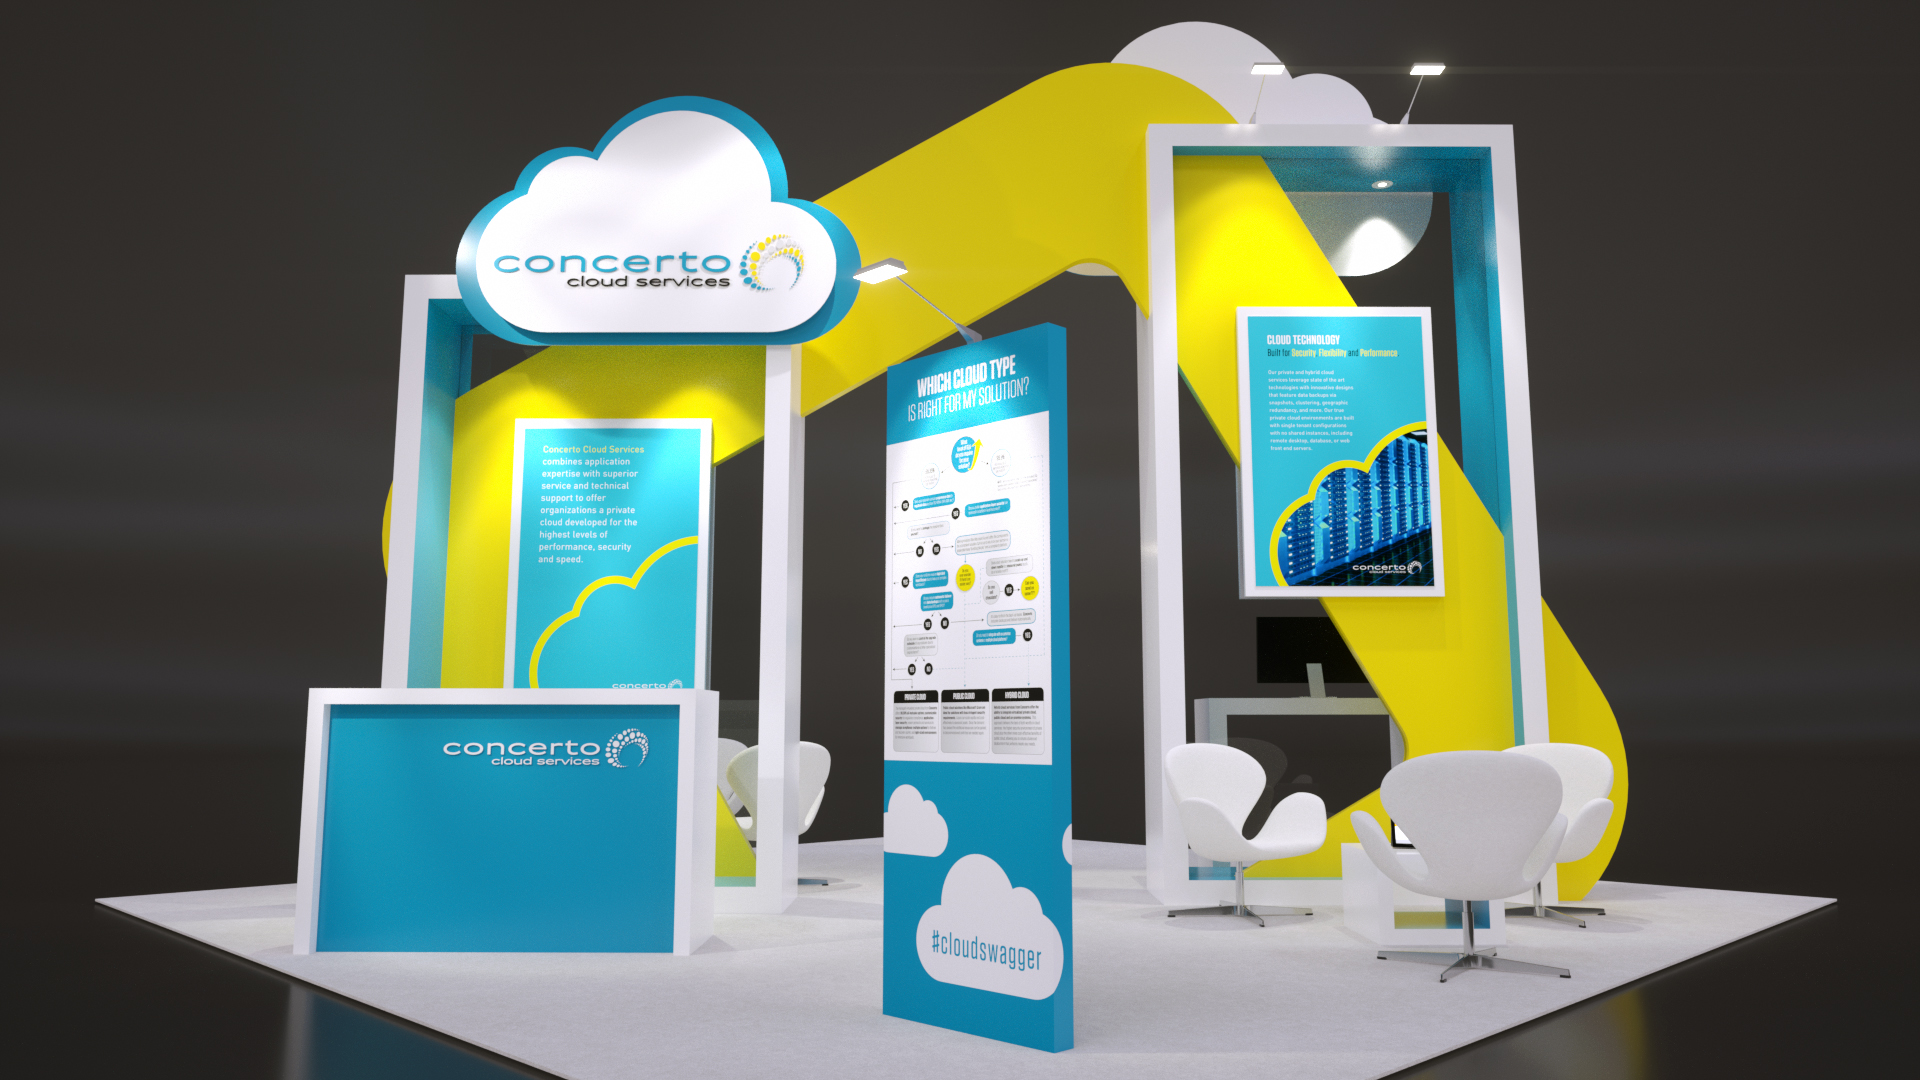 3053 - Concerto Cloud Services - Microsoft Envision 2016 - View 4.jpg